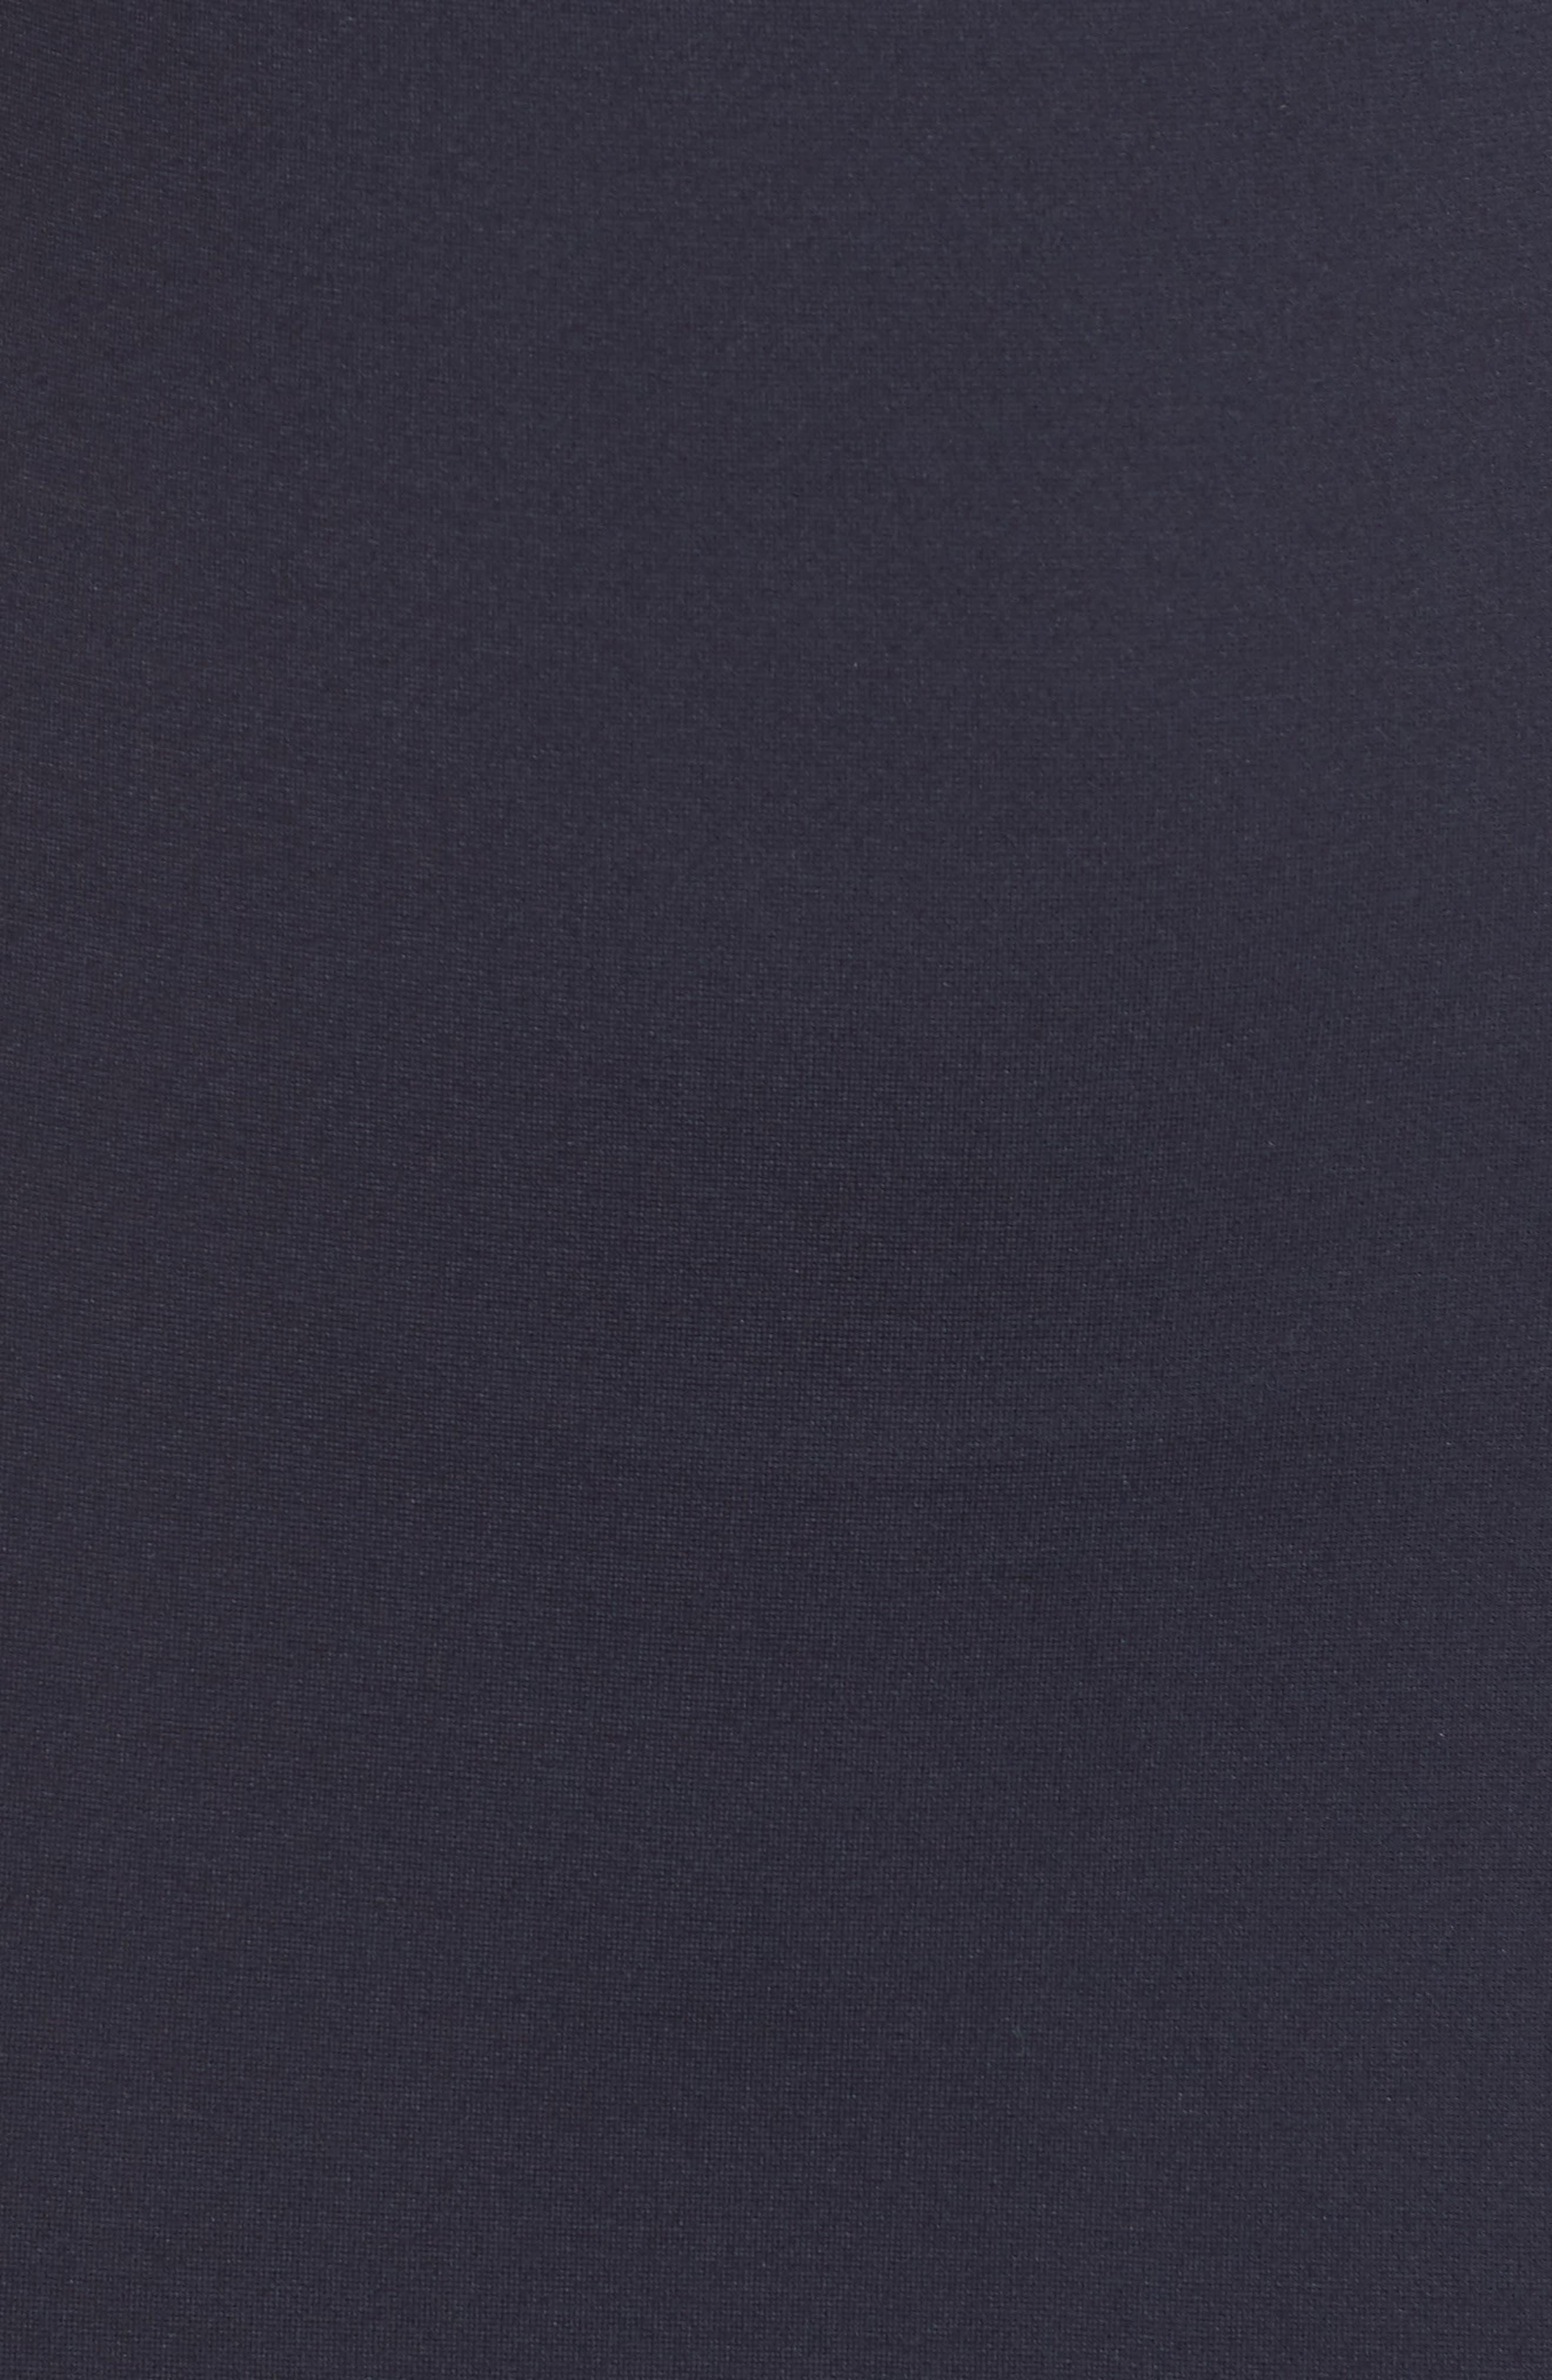 Off the Shoulder Sheath Dress,                             Alternate thumbnail 6, color,                             400